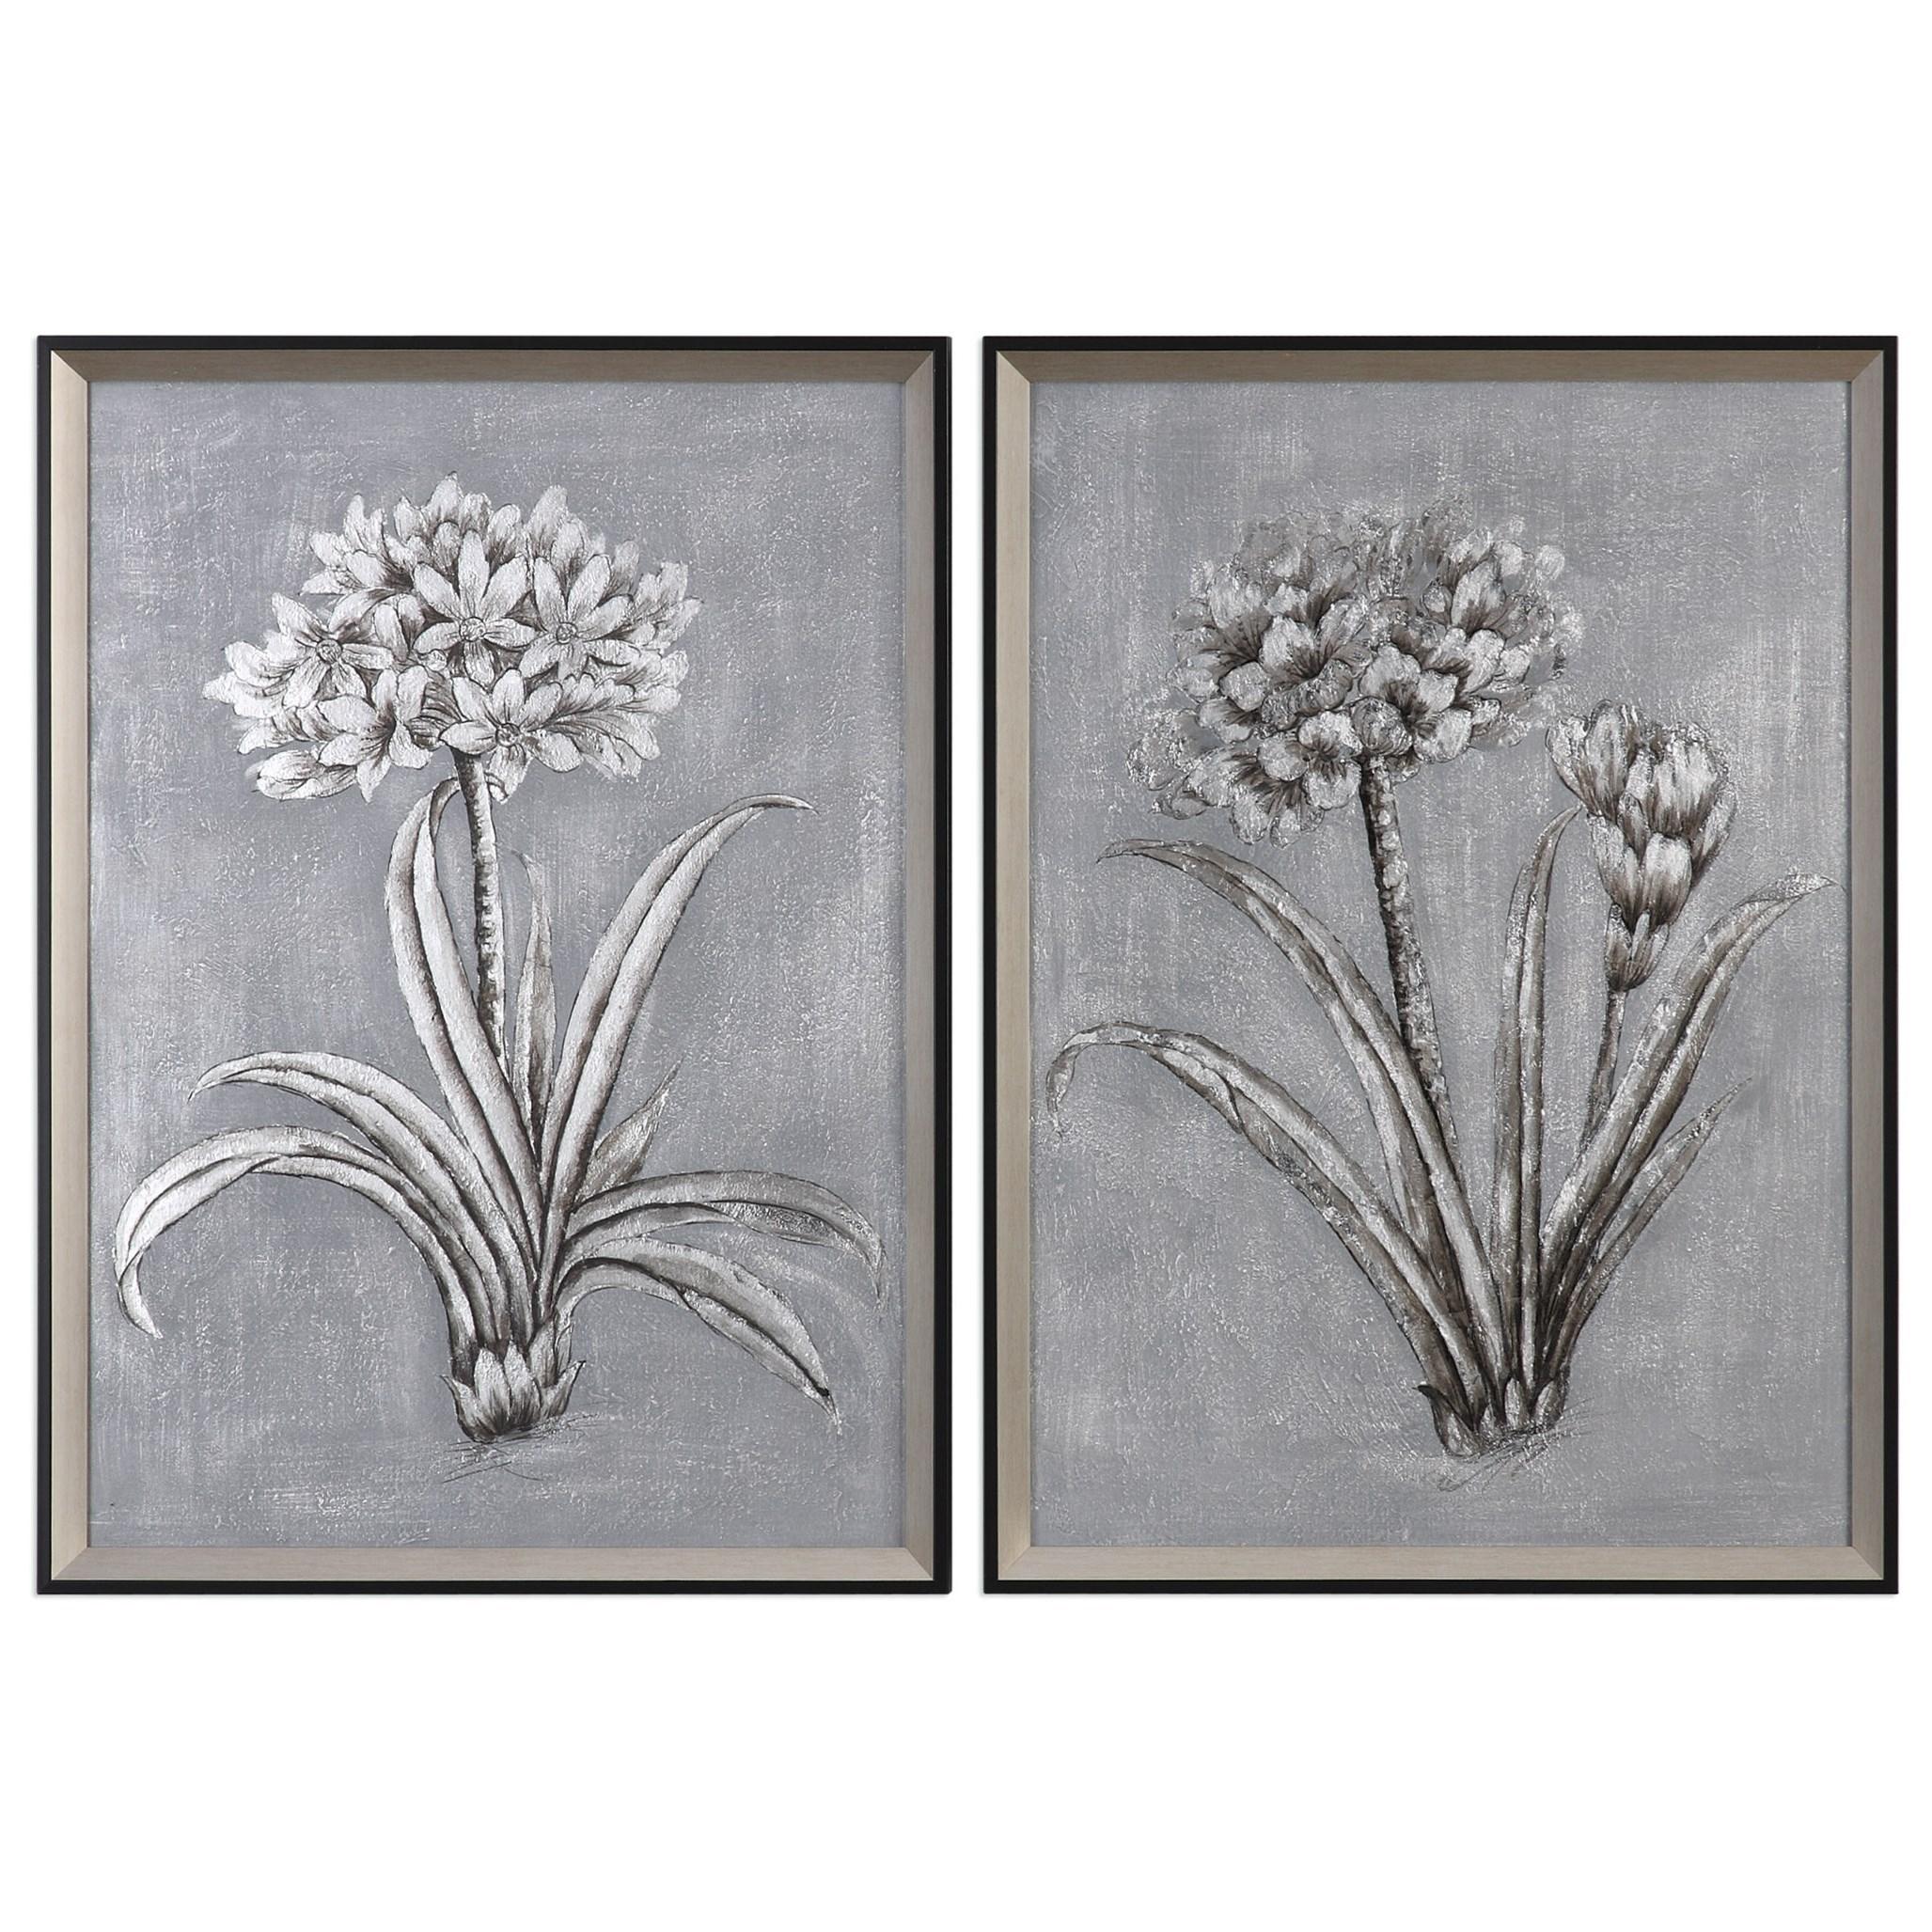 Uttermost Art Contemporary Botanicals (Set of 2) - Item Number: 34358